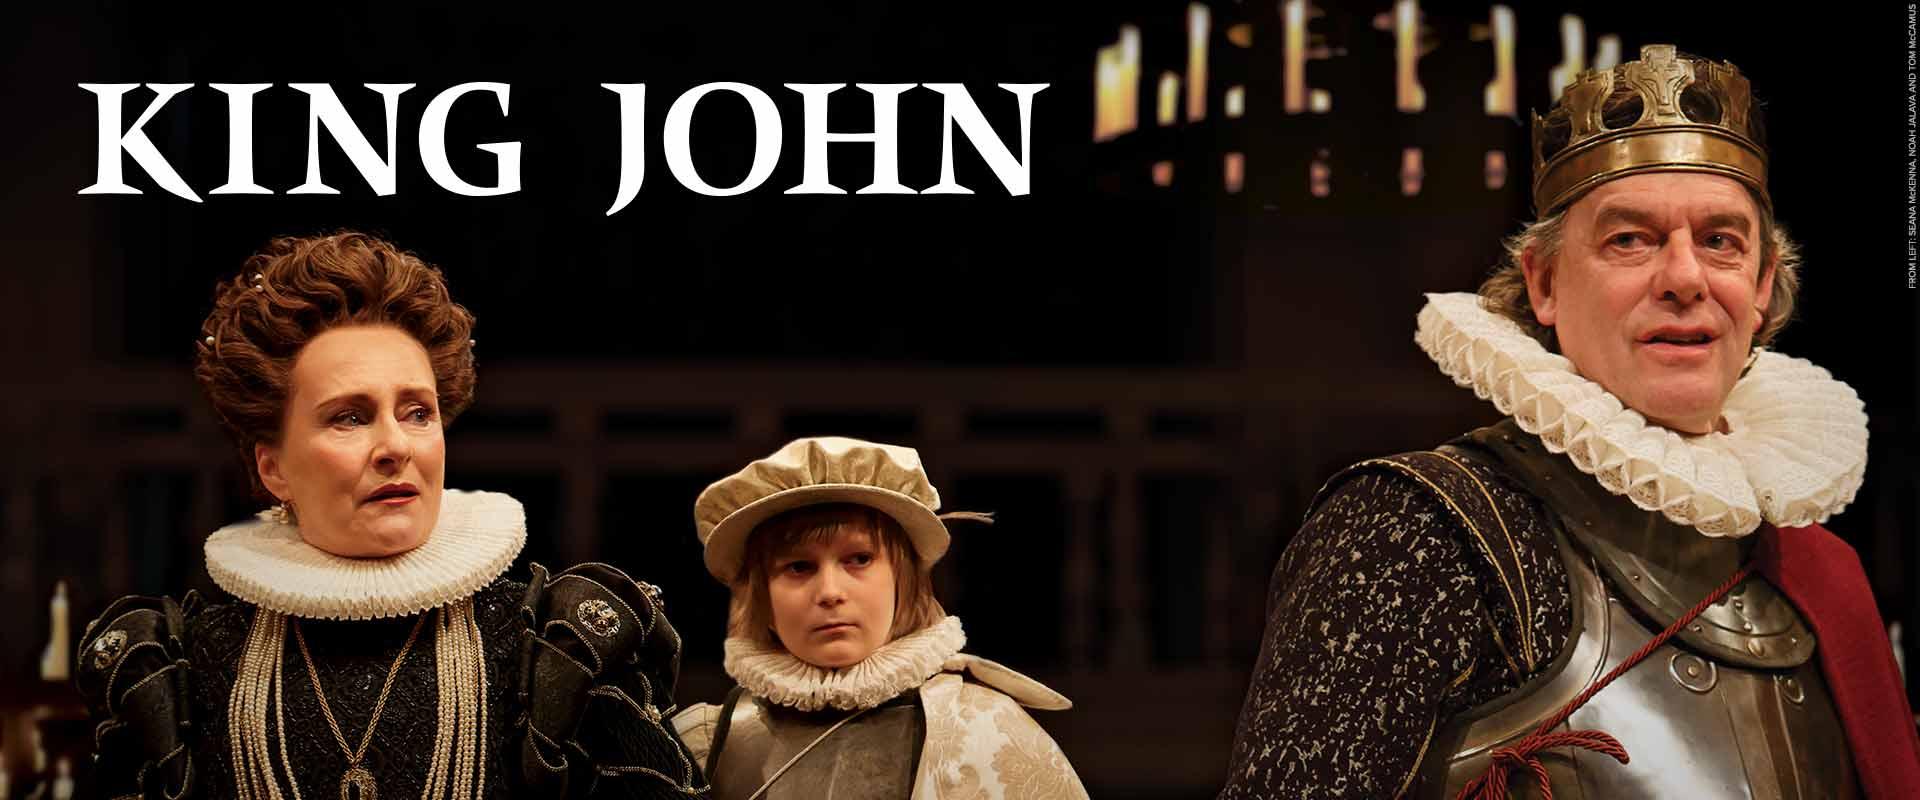 Tom McCamus and Seana McKenna in King John